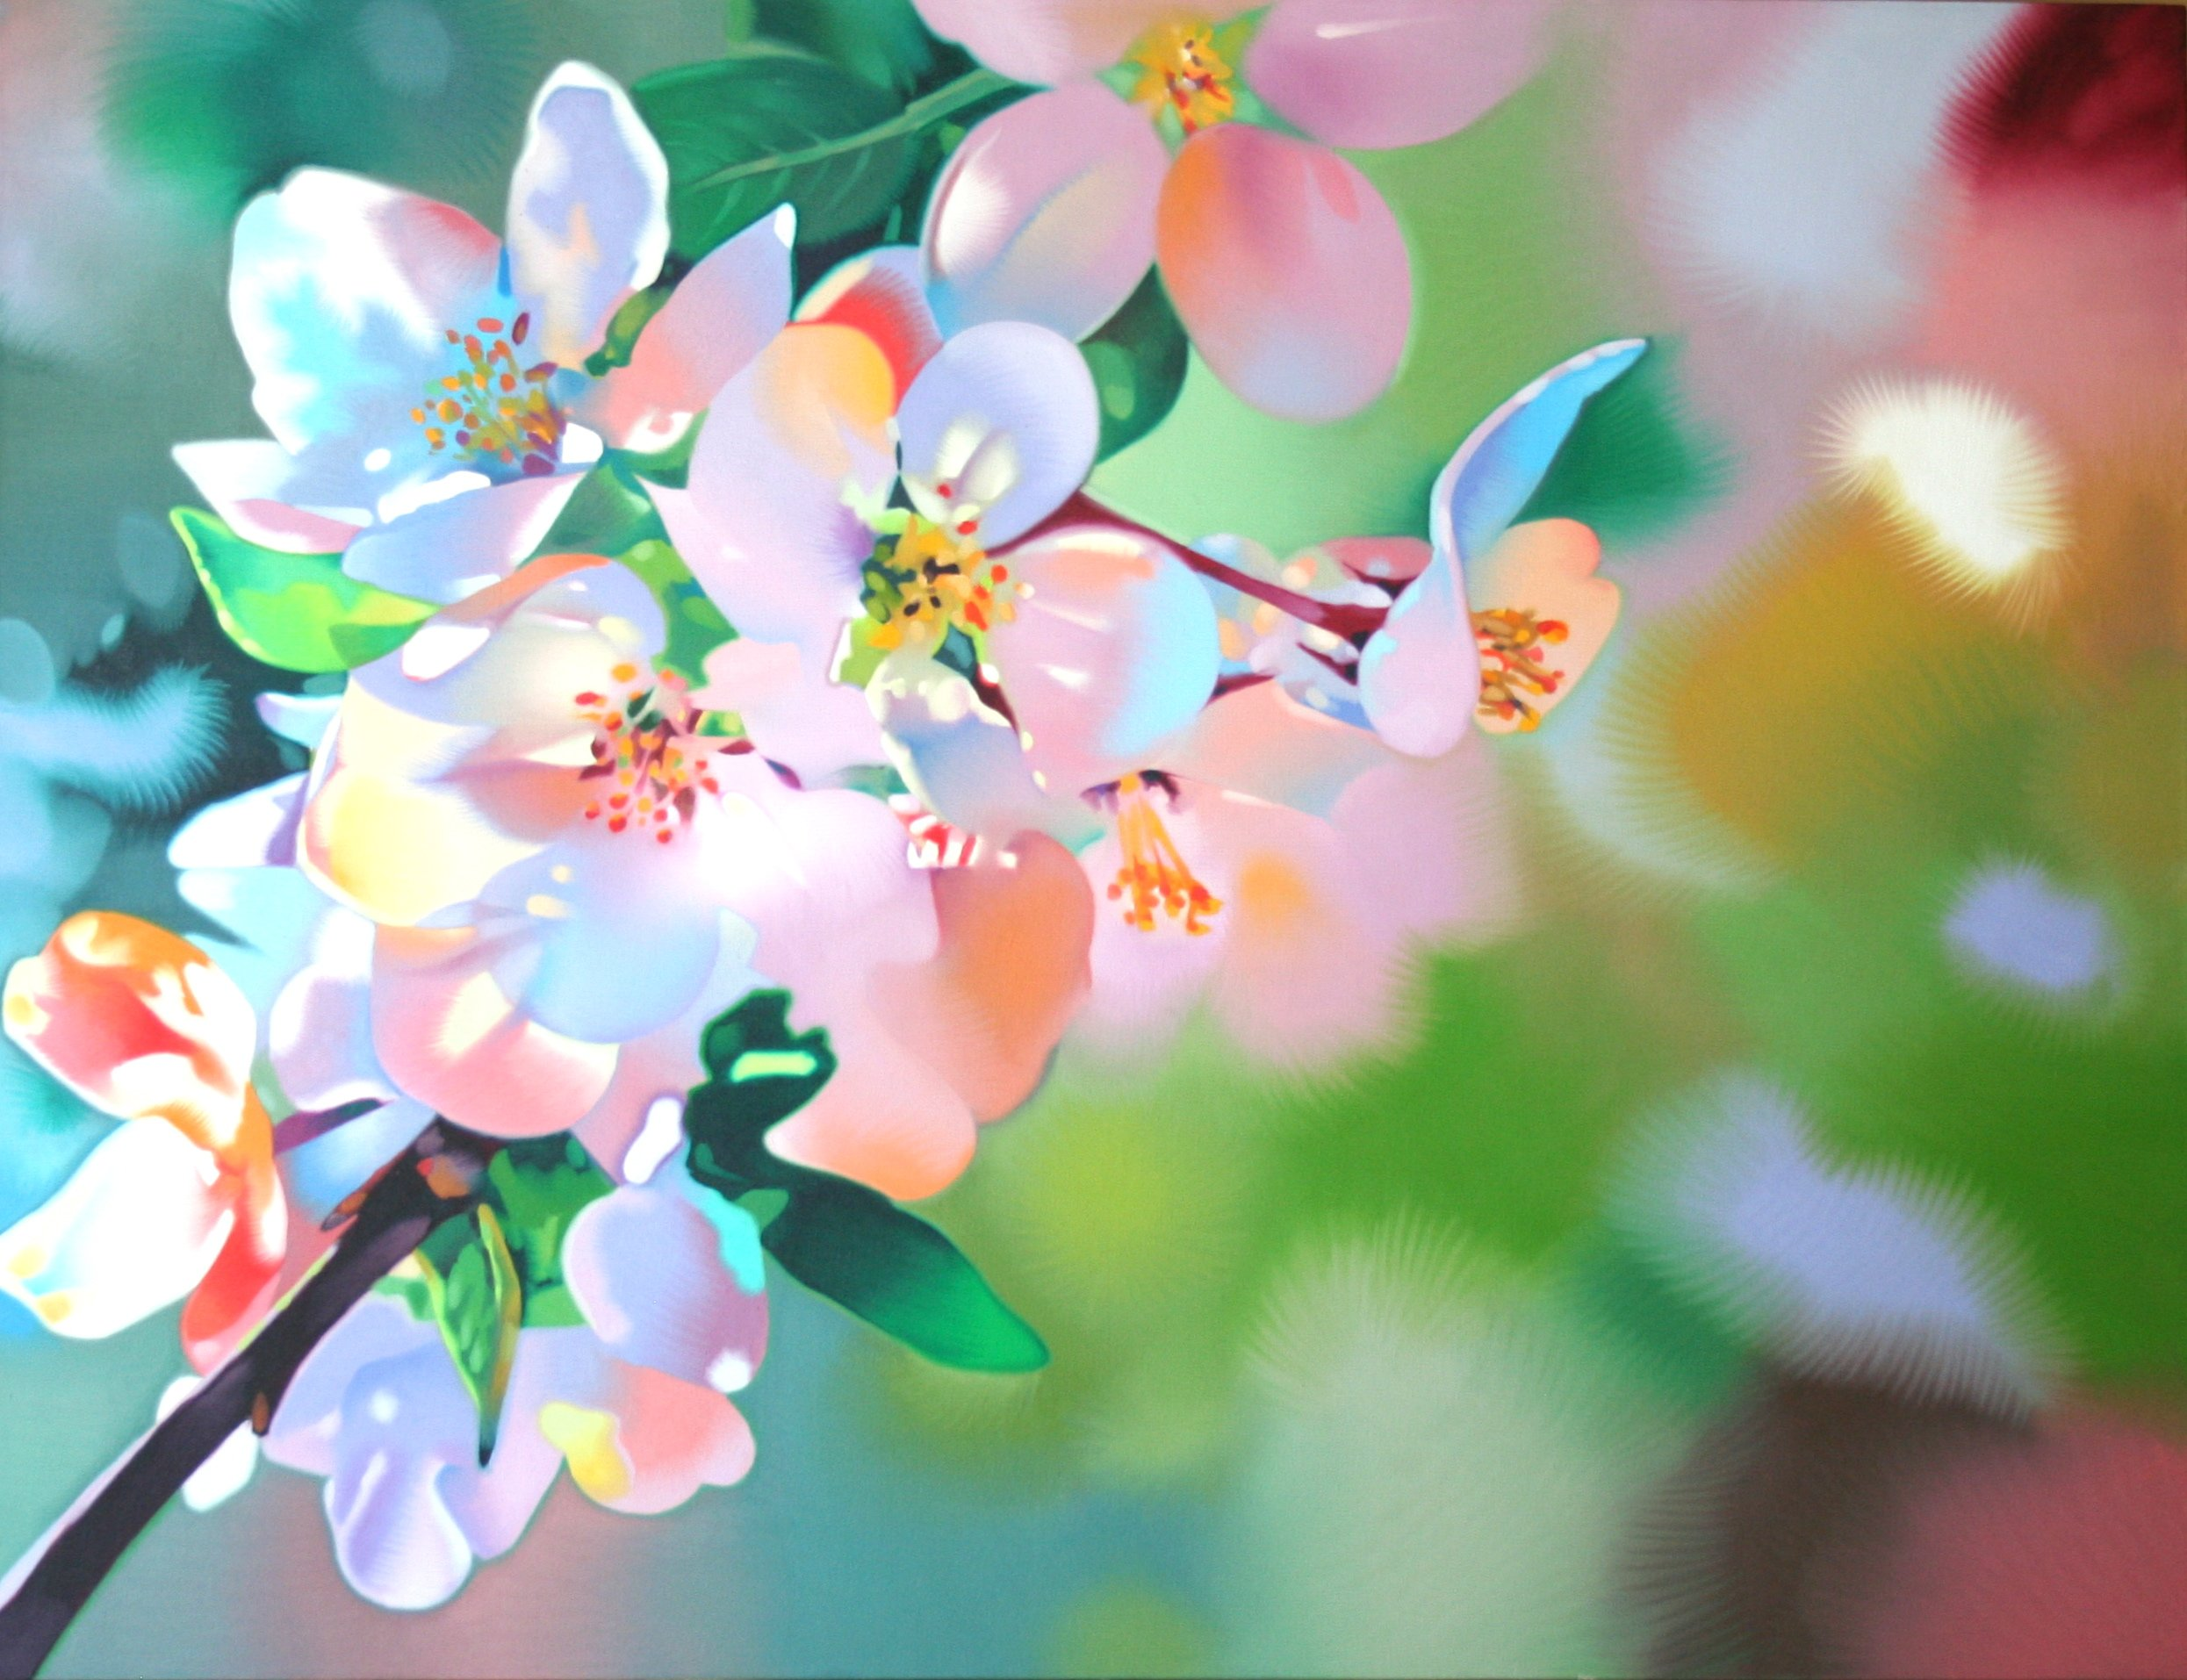 Pruner, Gary – Untitled Cherry Blossoms